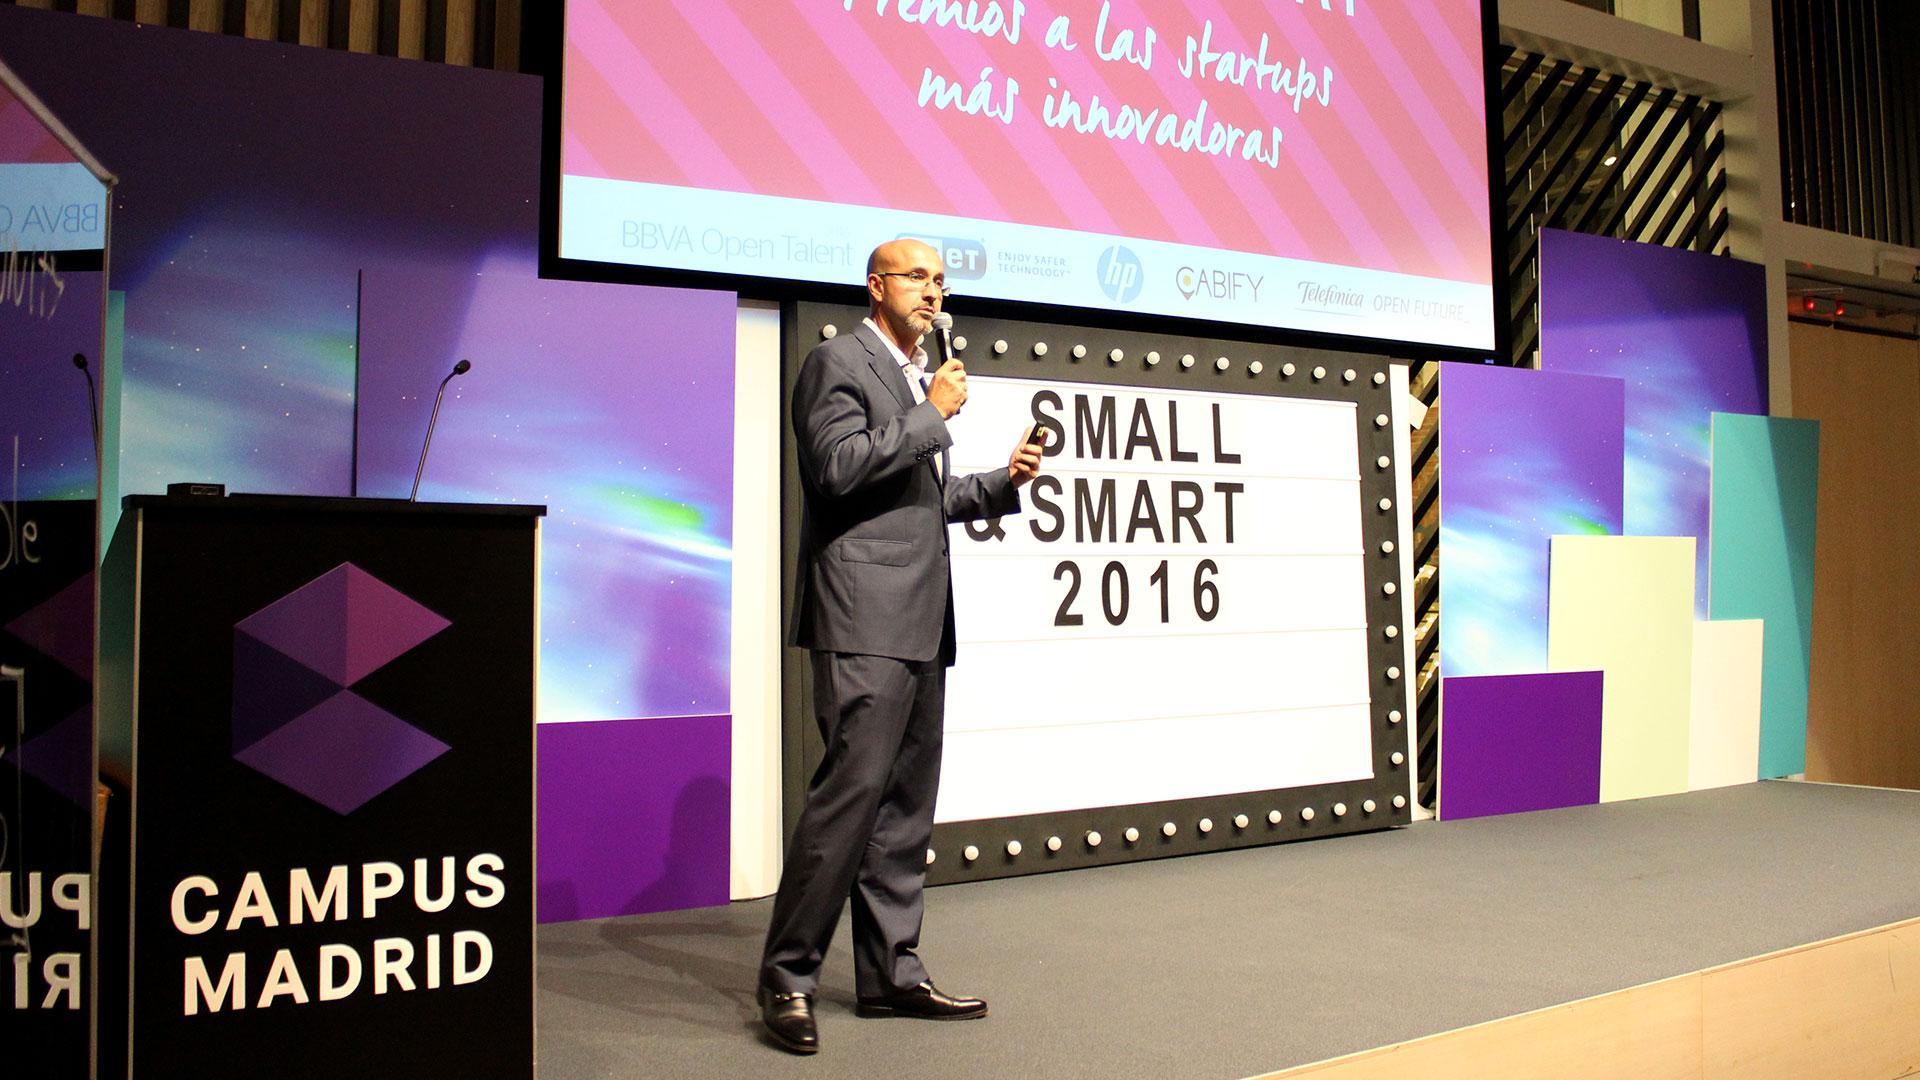 tpnet-small-smart-2016-evento-startups-prersentacion-javier-perez-cortijo-02